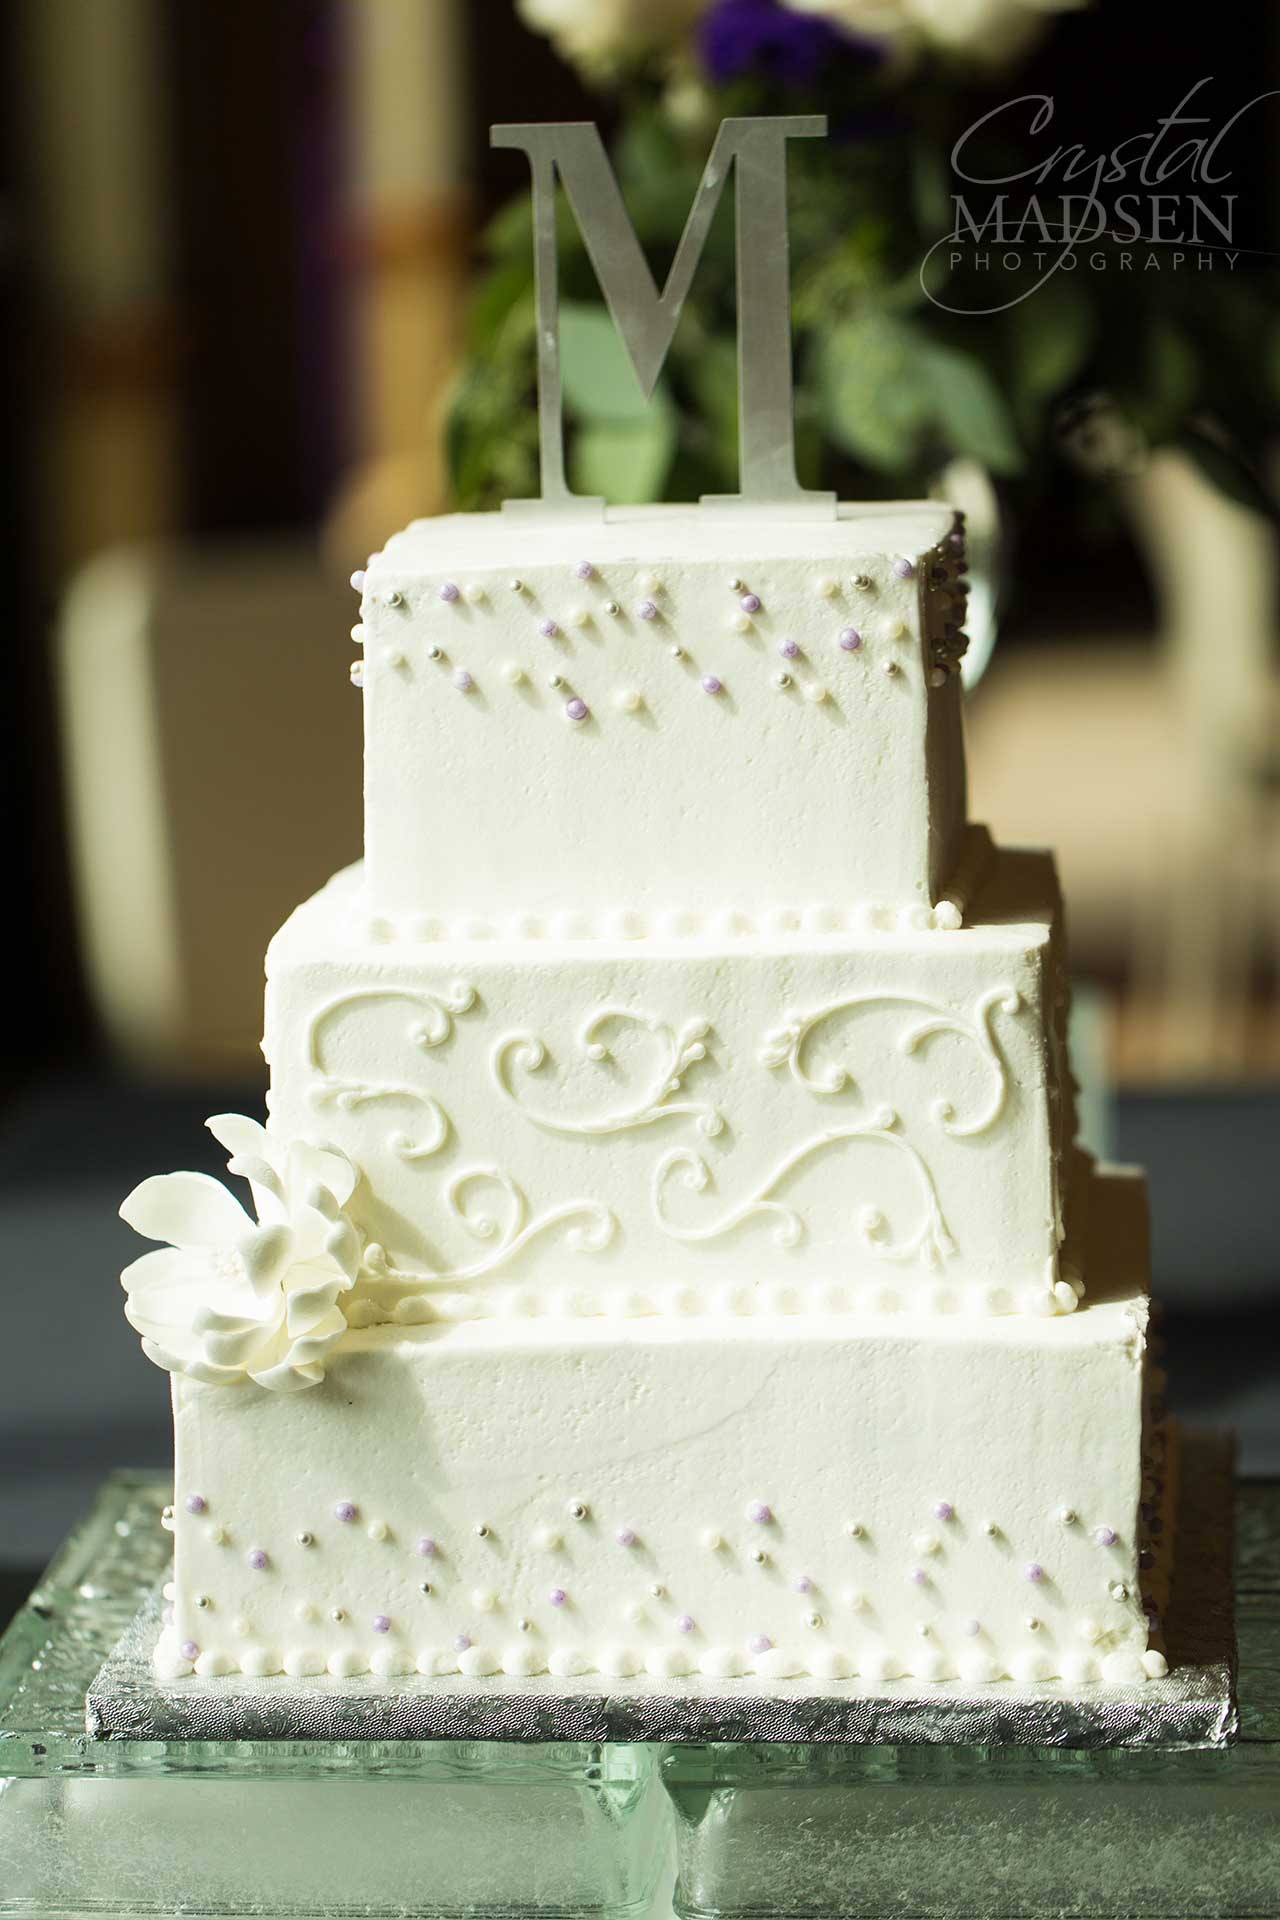 Cake Art Flavours : Its cake season- The joy of a summer wedding - Crystal ...